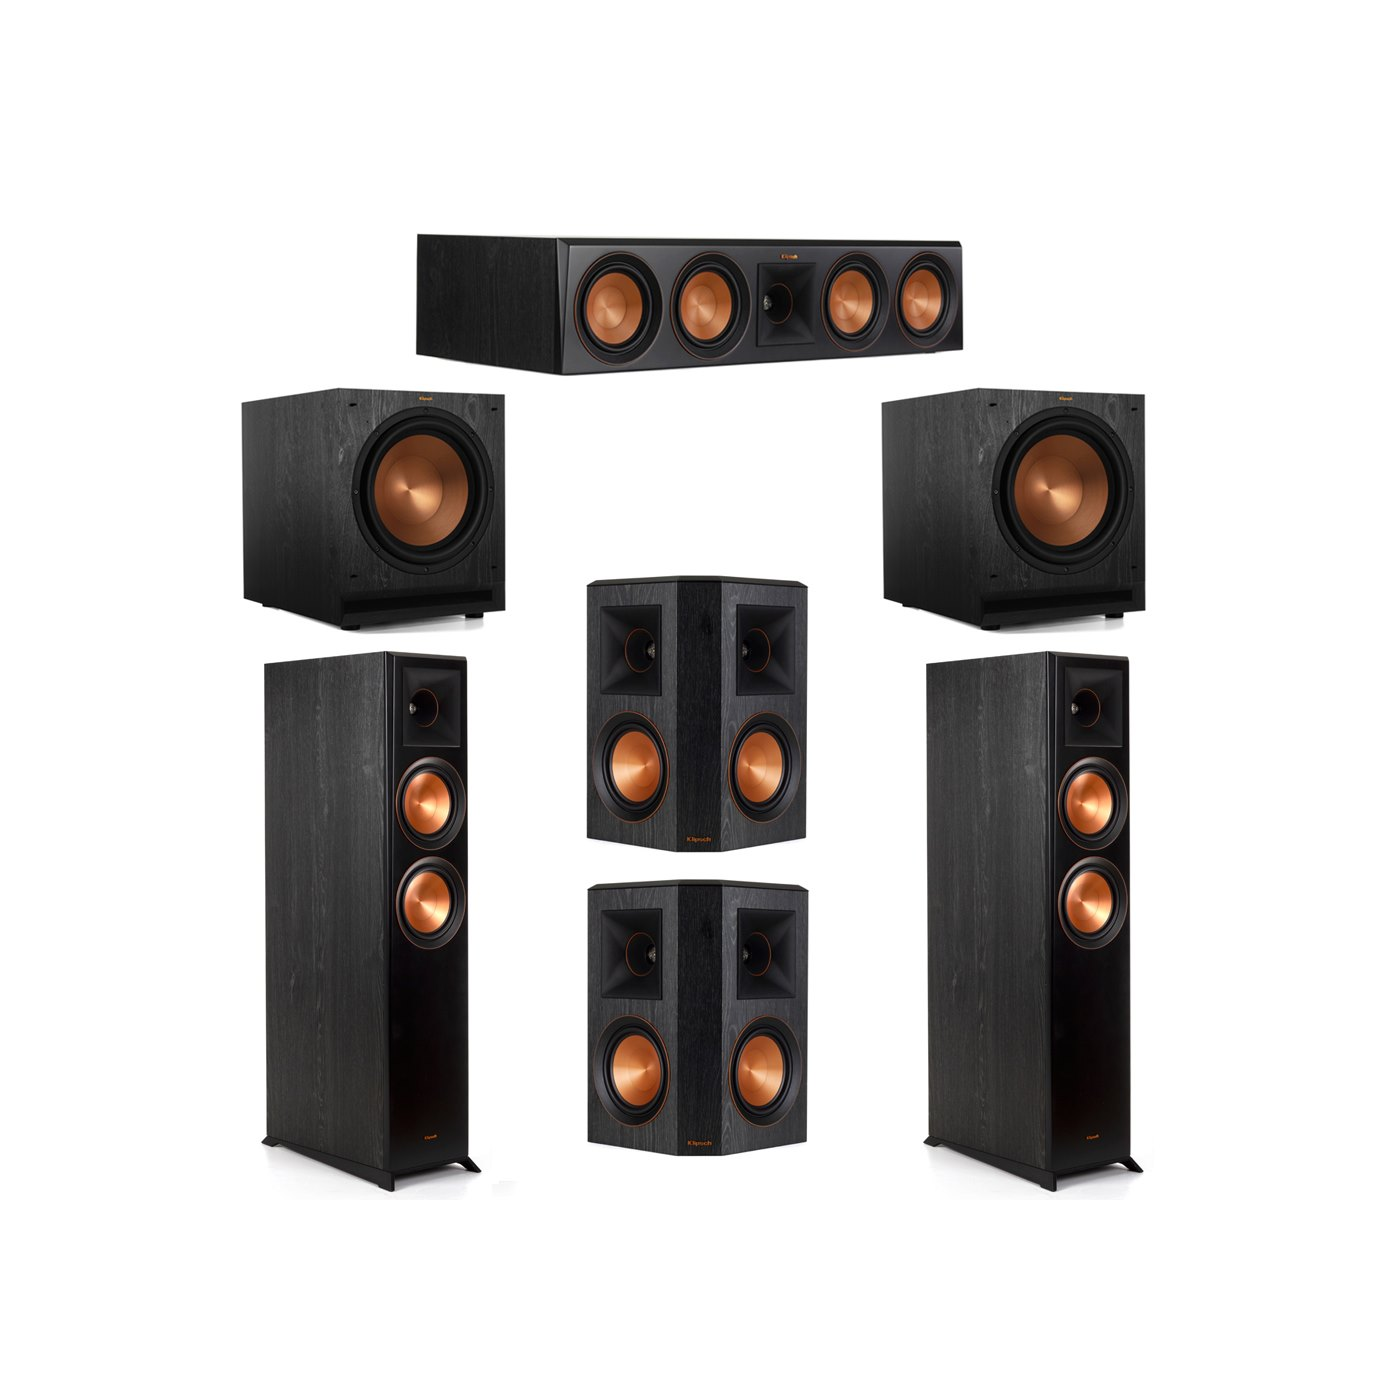 Klipsch 5.2 System with 2 RP-6000F Floorstanding Speakers, 1 Klipsch RP-504C Center Speaker, 2 Klipsch RP-502S Surround Speakers, 2 Klipsch SPL-120 Subwoofers